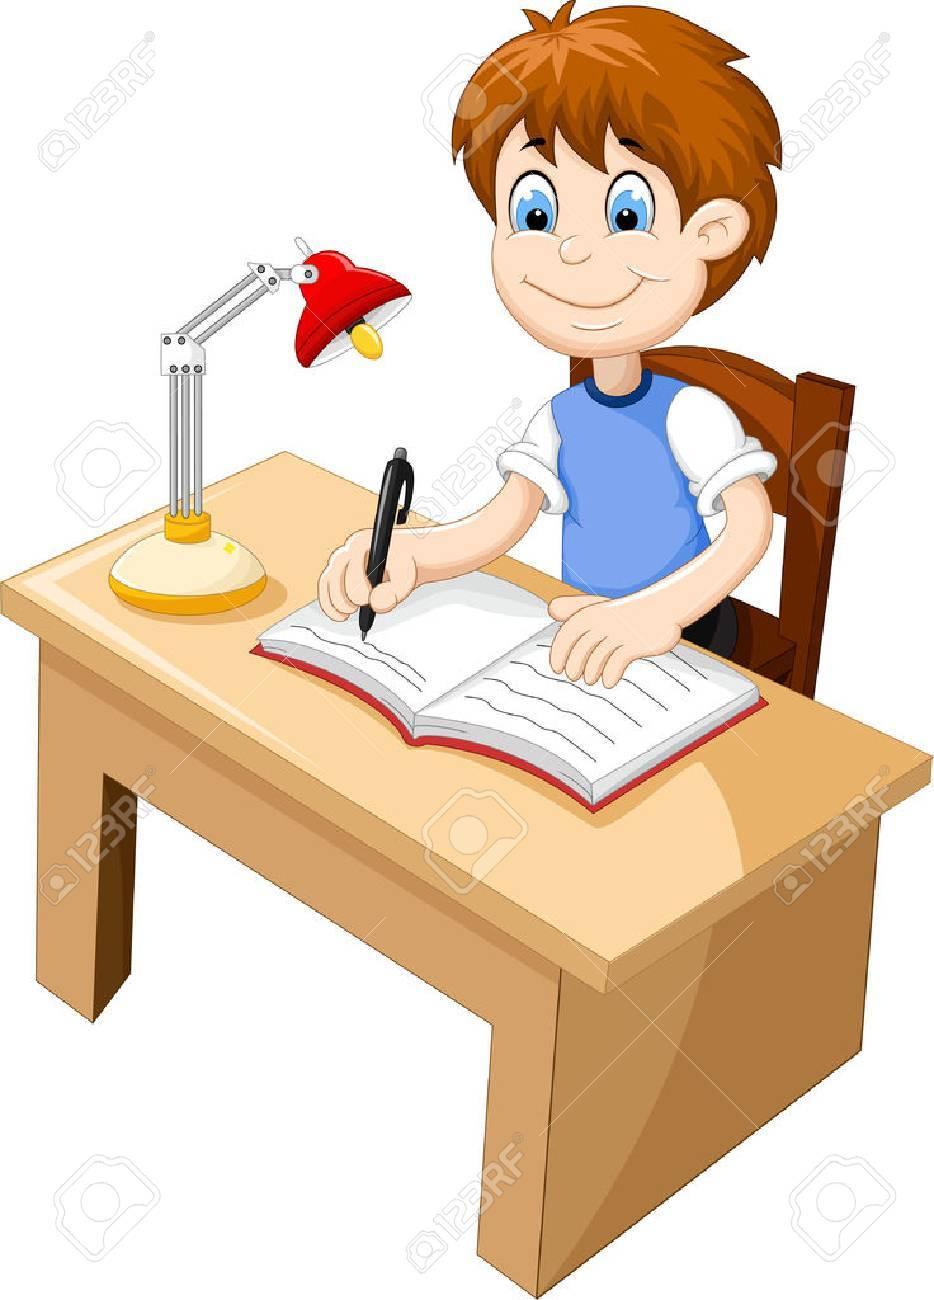 funny Boy cartoon studying at a desk - 65826742